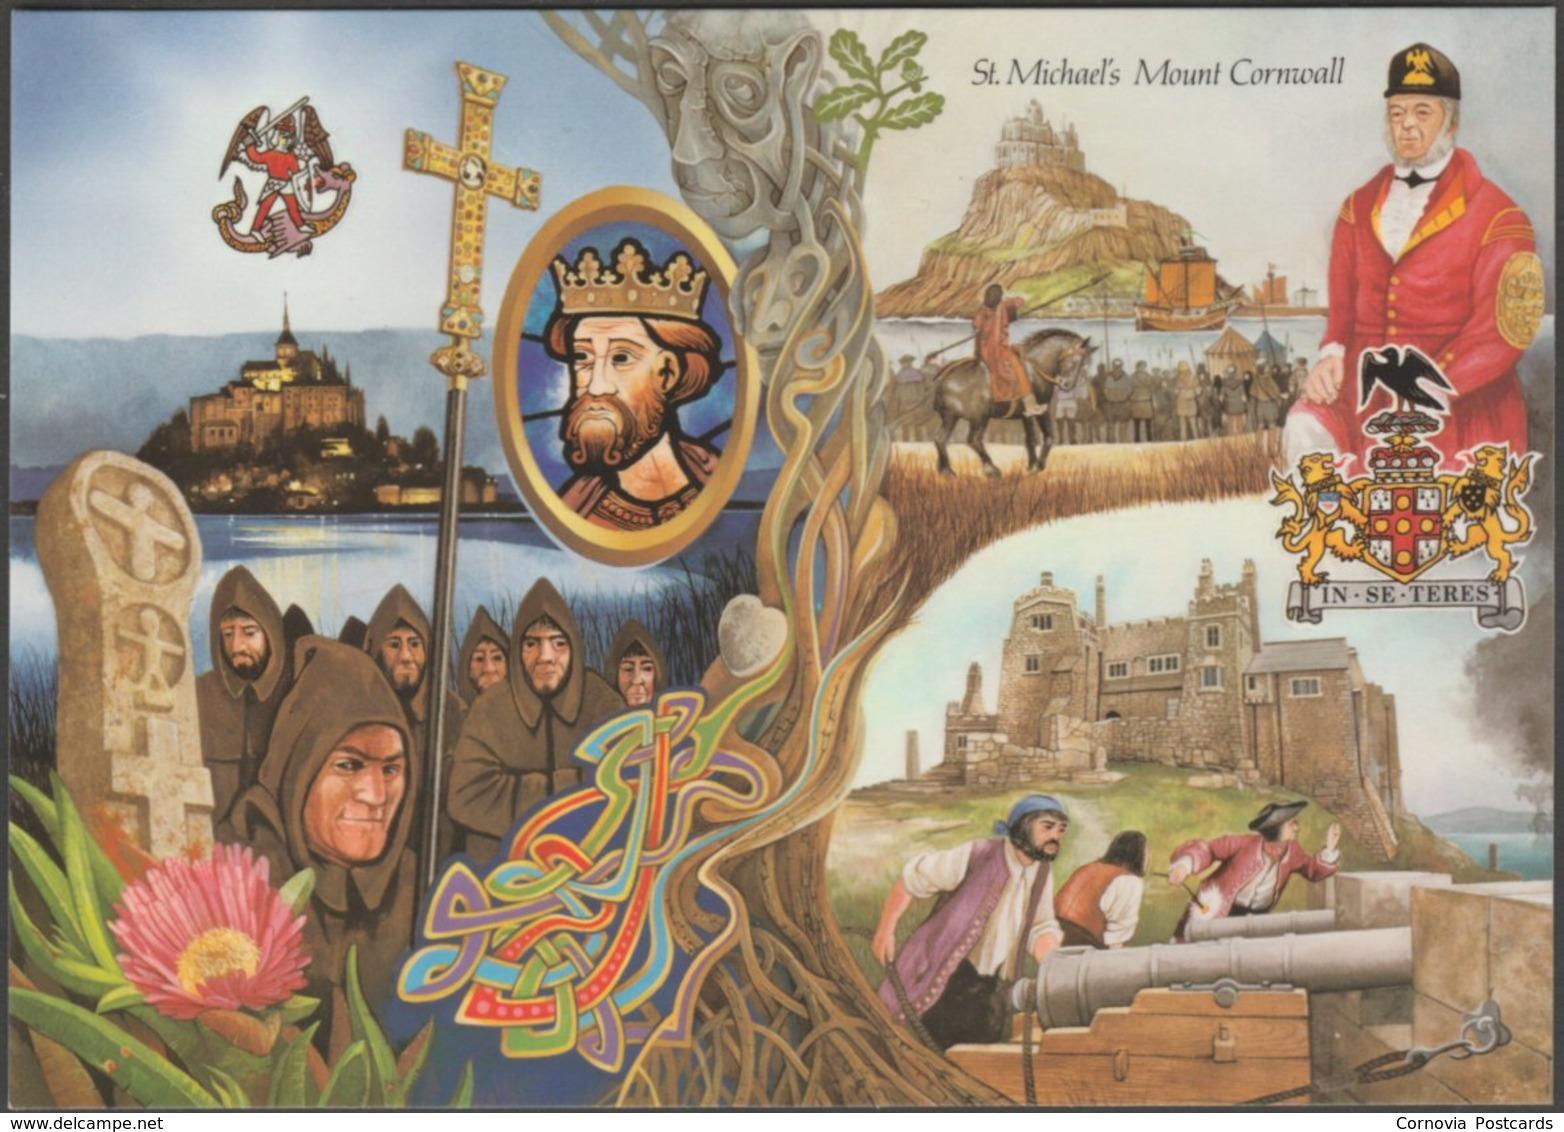 St Michael's Mount, Cornwall, C.1980s - Murray King Postcard - St Michael's Mount